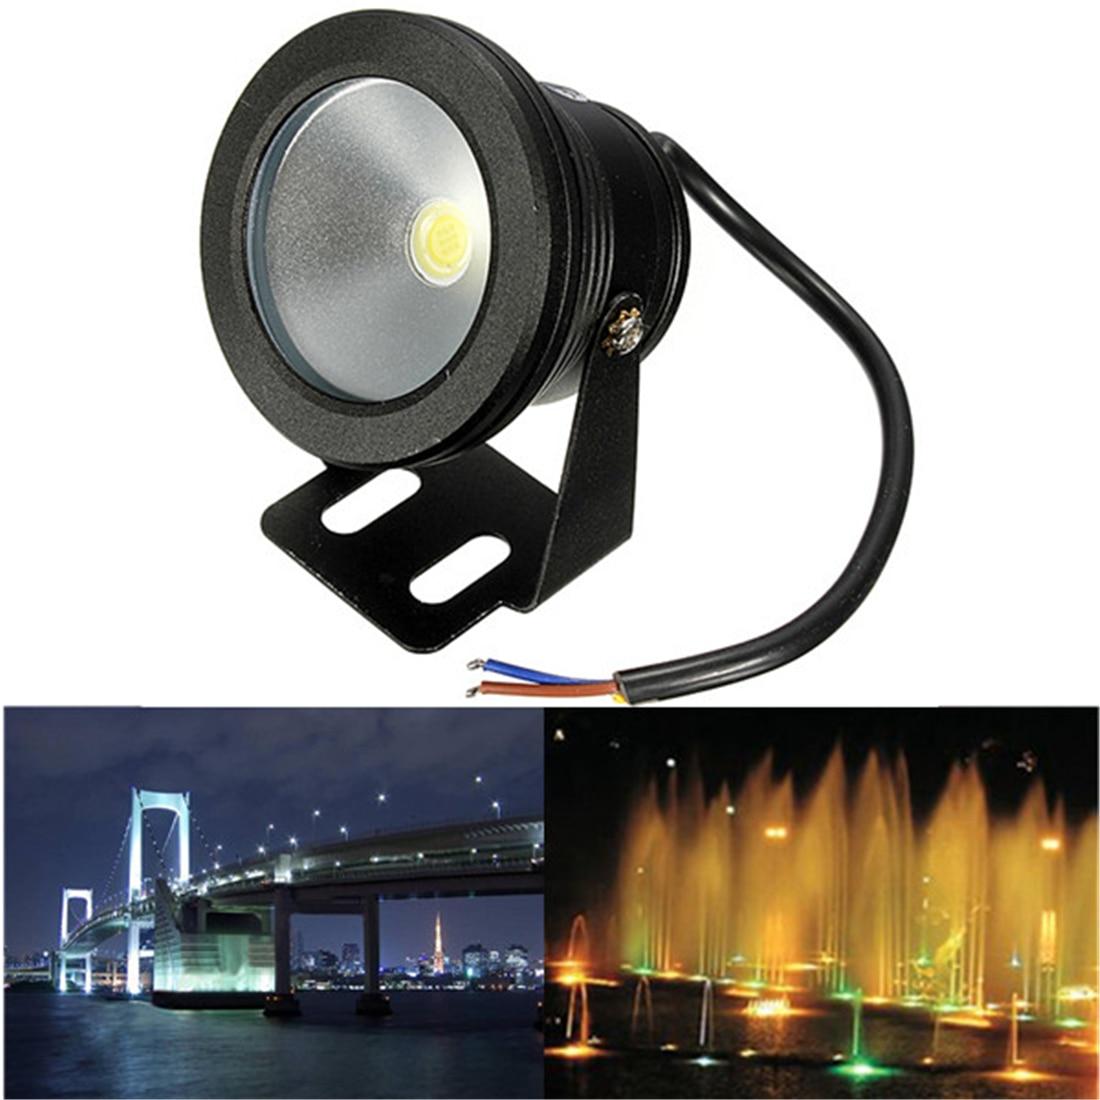 1pc 10W 12V Waterproof LED Flood Light Underwater Fountain Light Wash Pond Fish Tank Aquarium Light Spot Lamp Outdoor Lighting